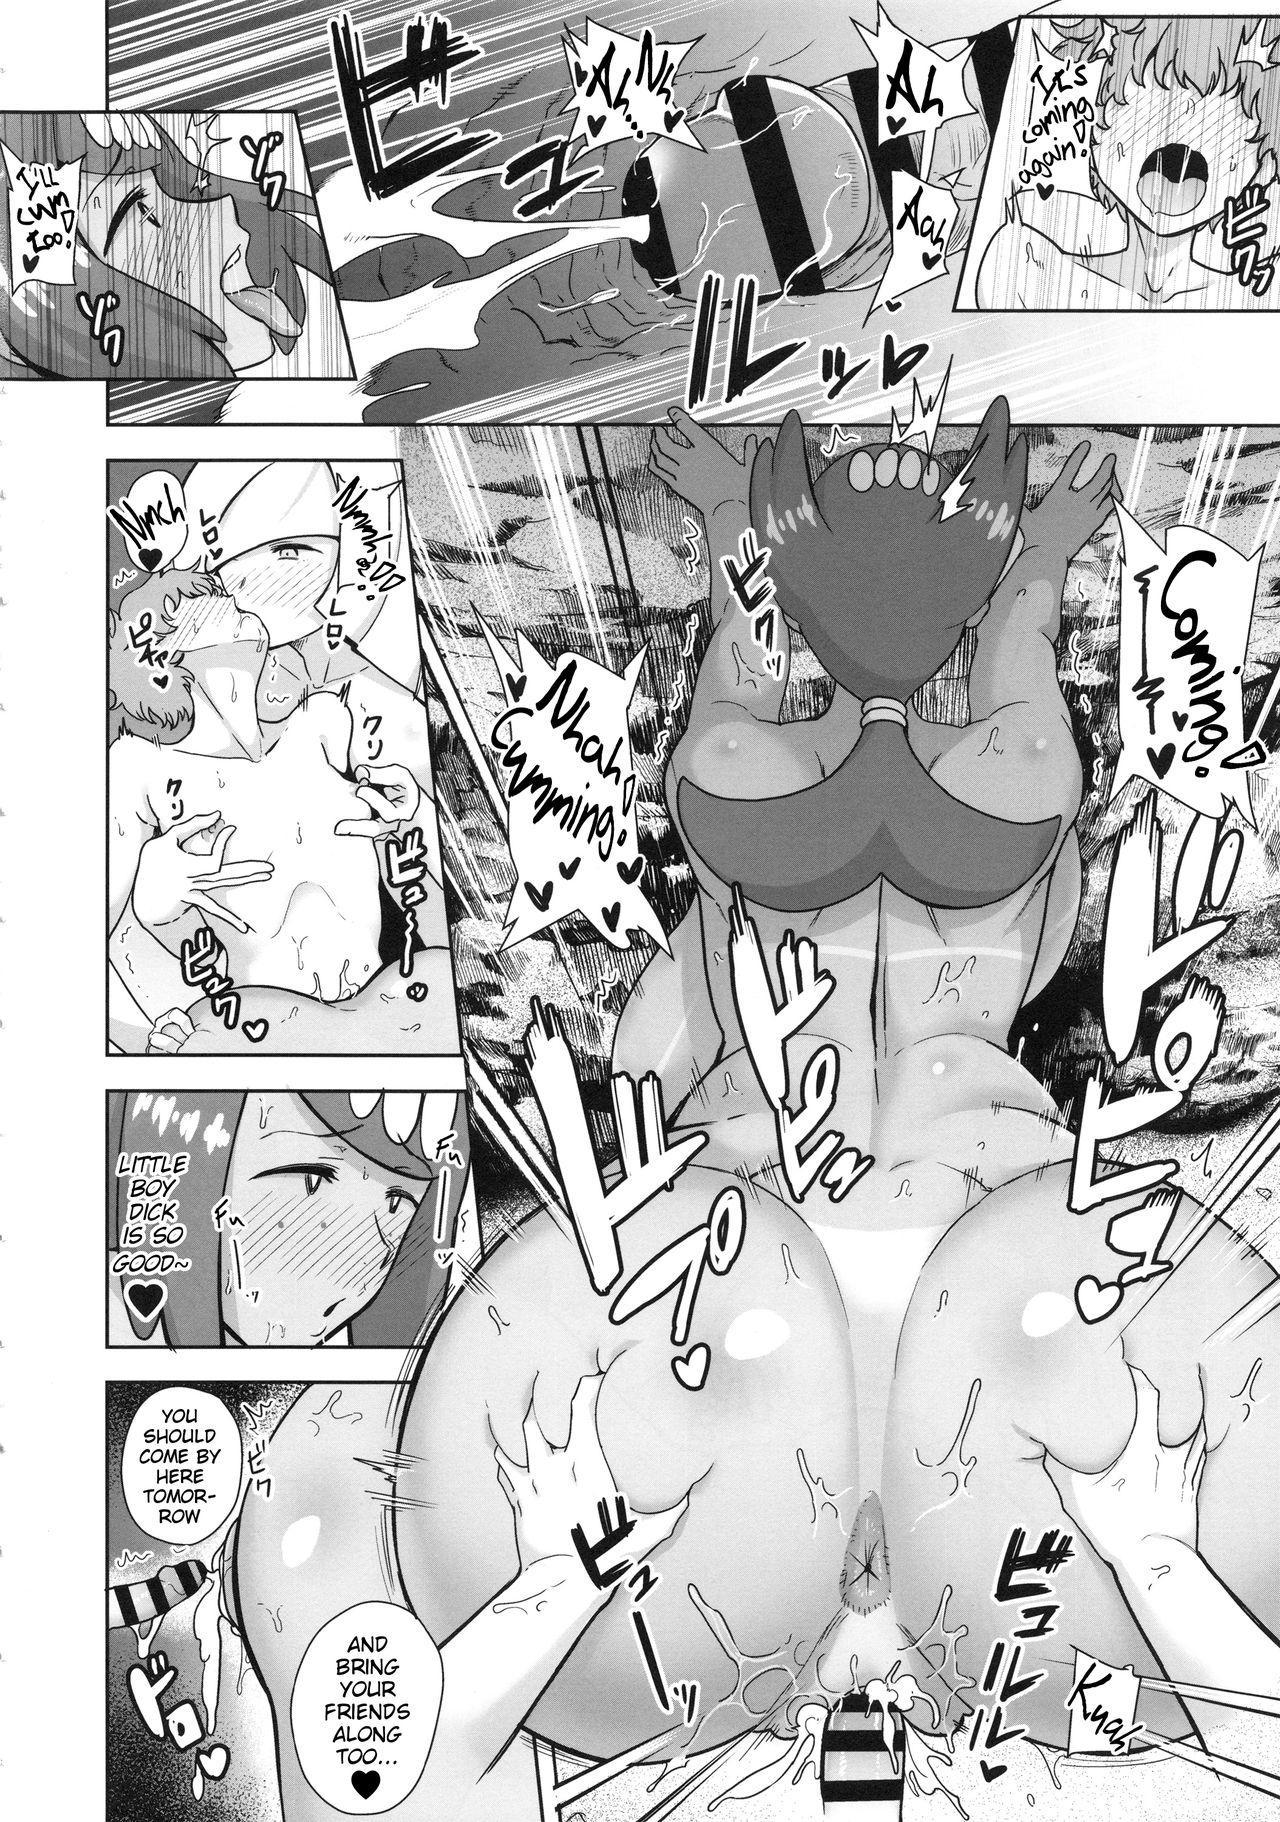 (SC2019 Spring) [DOLL PLAY (Kurosu Gatari)] Alola no Yoru no Sugata 3 (Pokémon Sun and Moon) | The Feeling of Alolan Night 3 [English] [Learn JP With H] 8